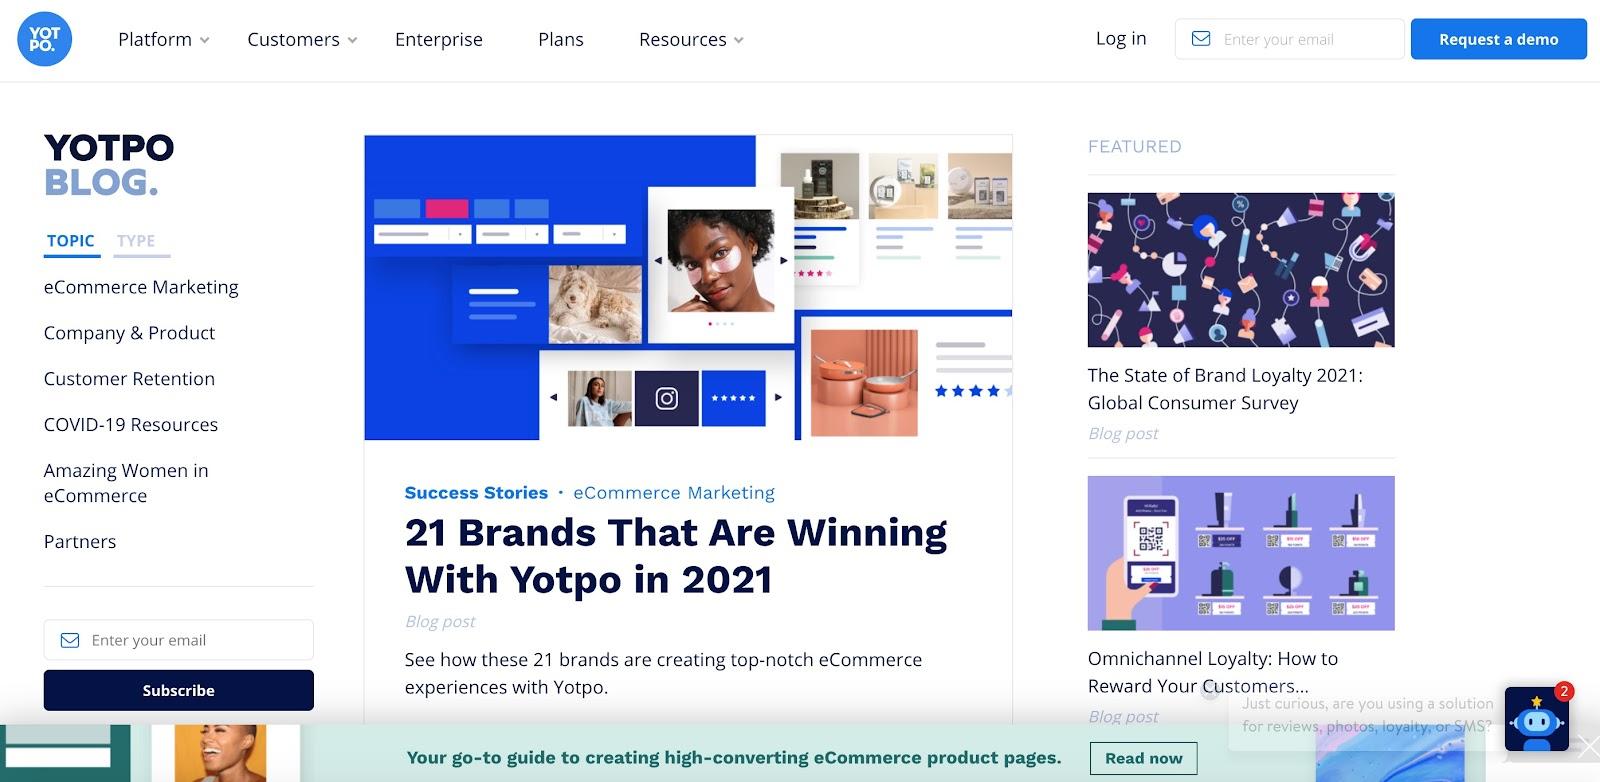 yotpo blog